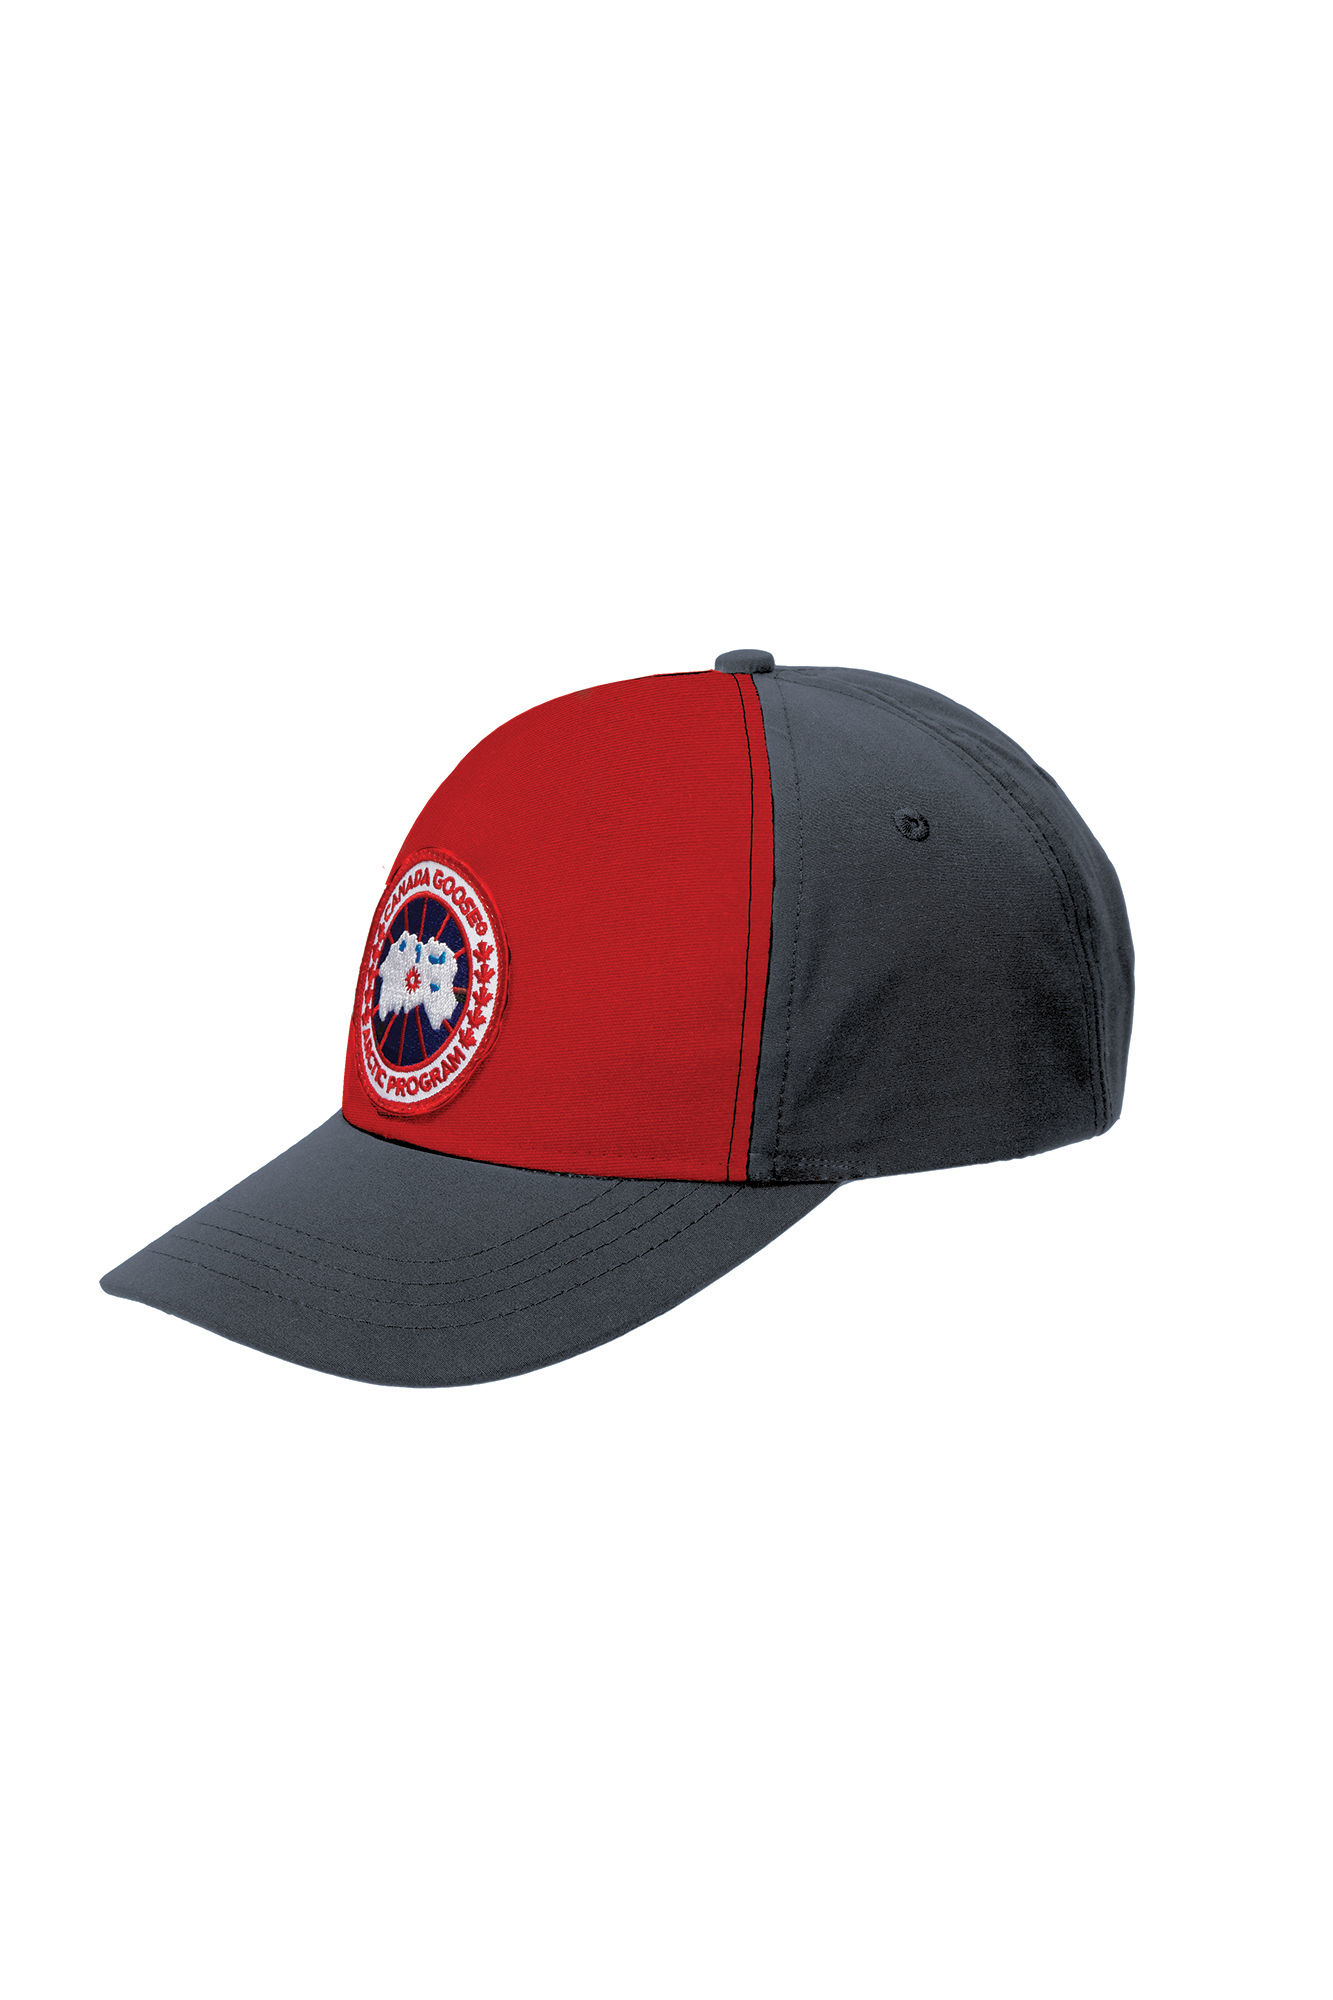 3f3daccdf canada goose fake hat